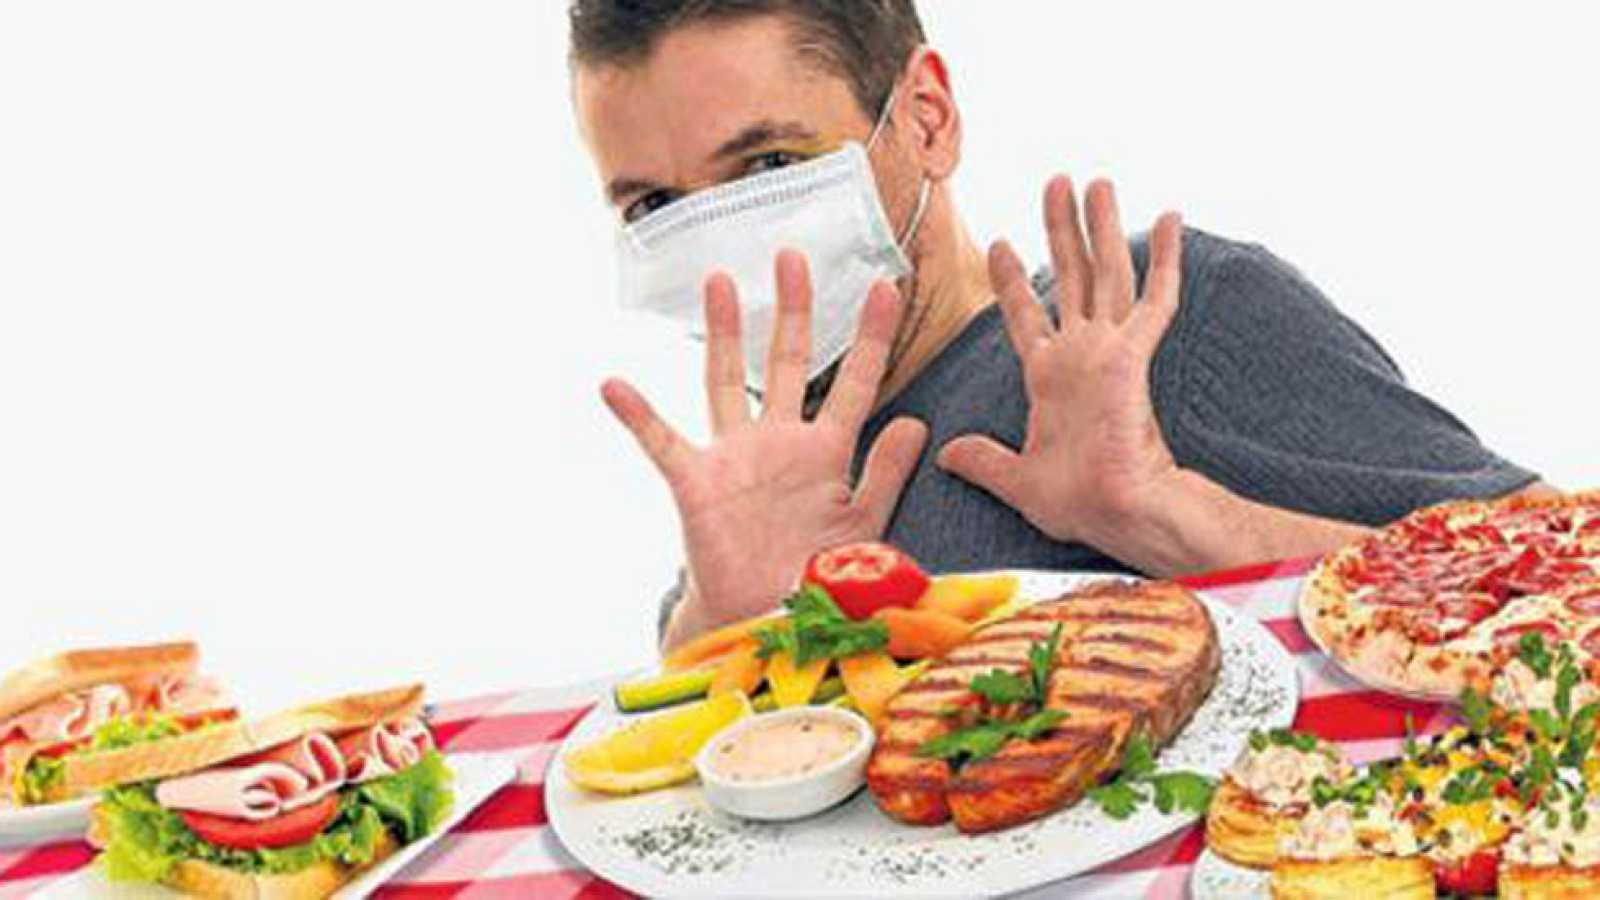 Saber Vivir -  Alimentos que sientan mal